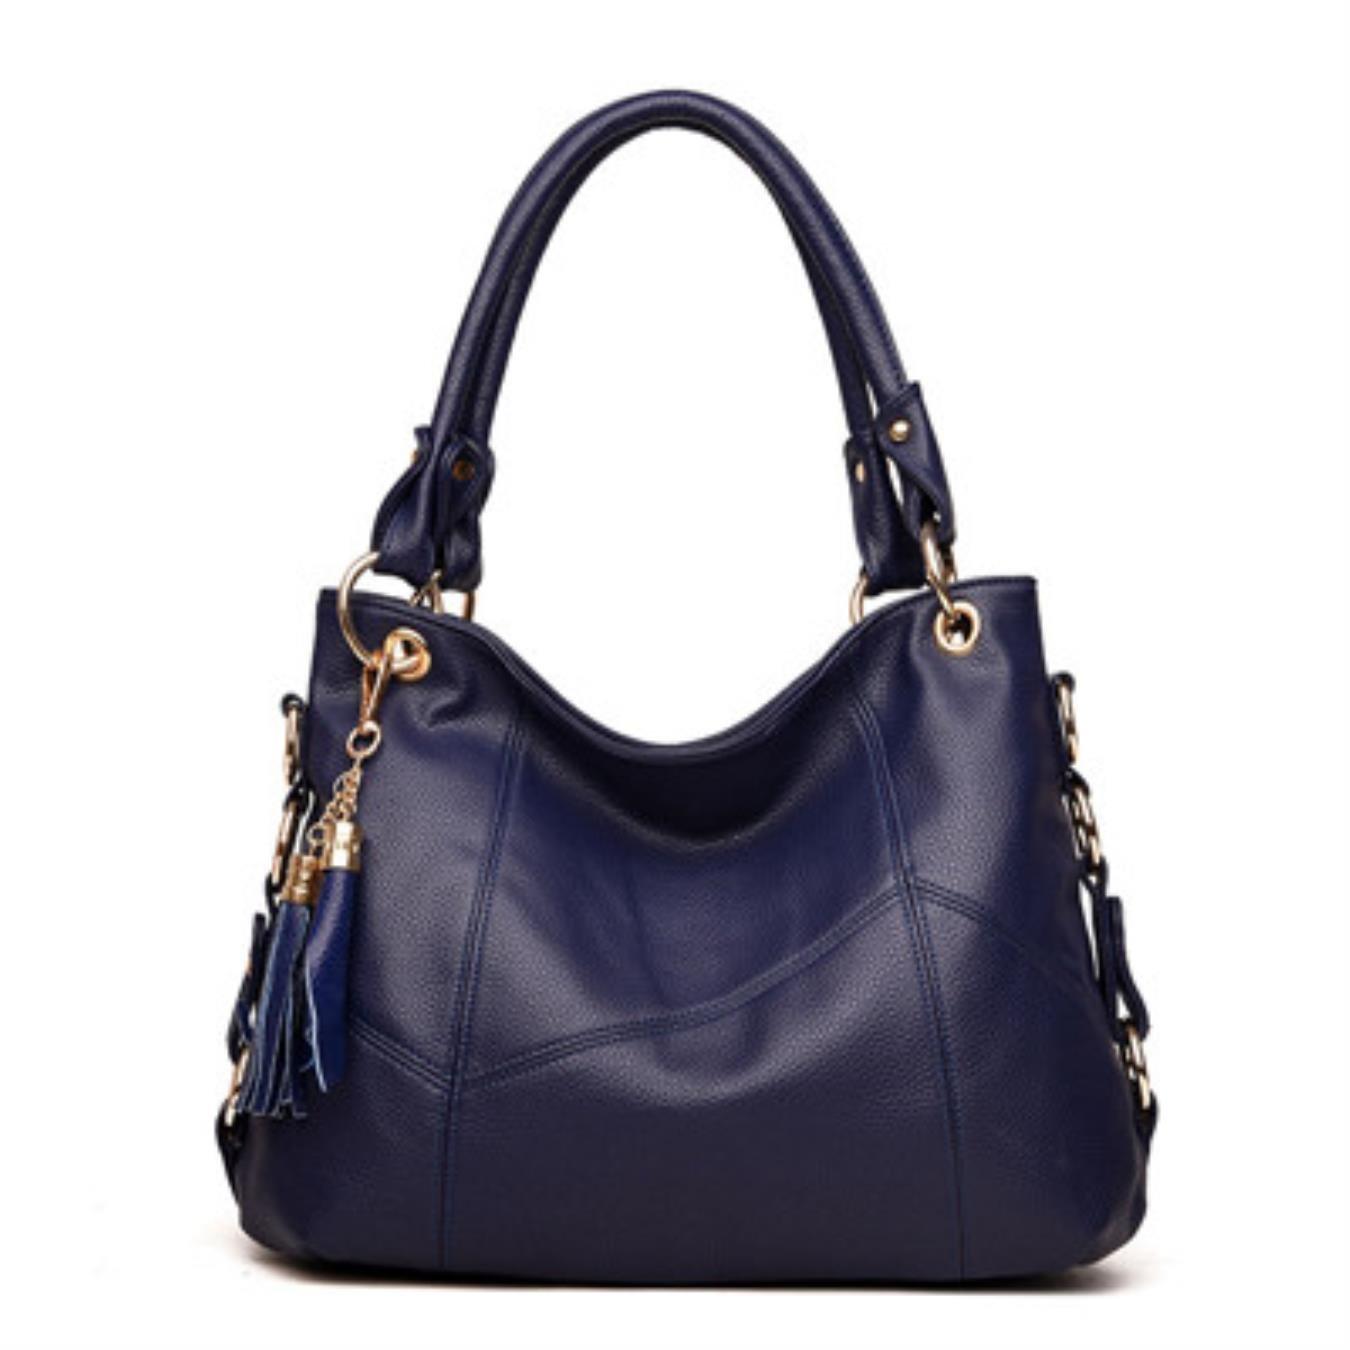 bluee Women Leather Handbags Tassel Messenger Bags Designer Crossbody Bag Women Shoulder Bag Tophandle Bags Vintage